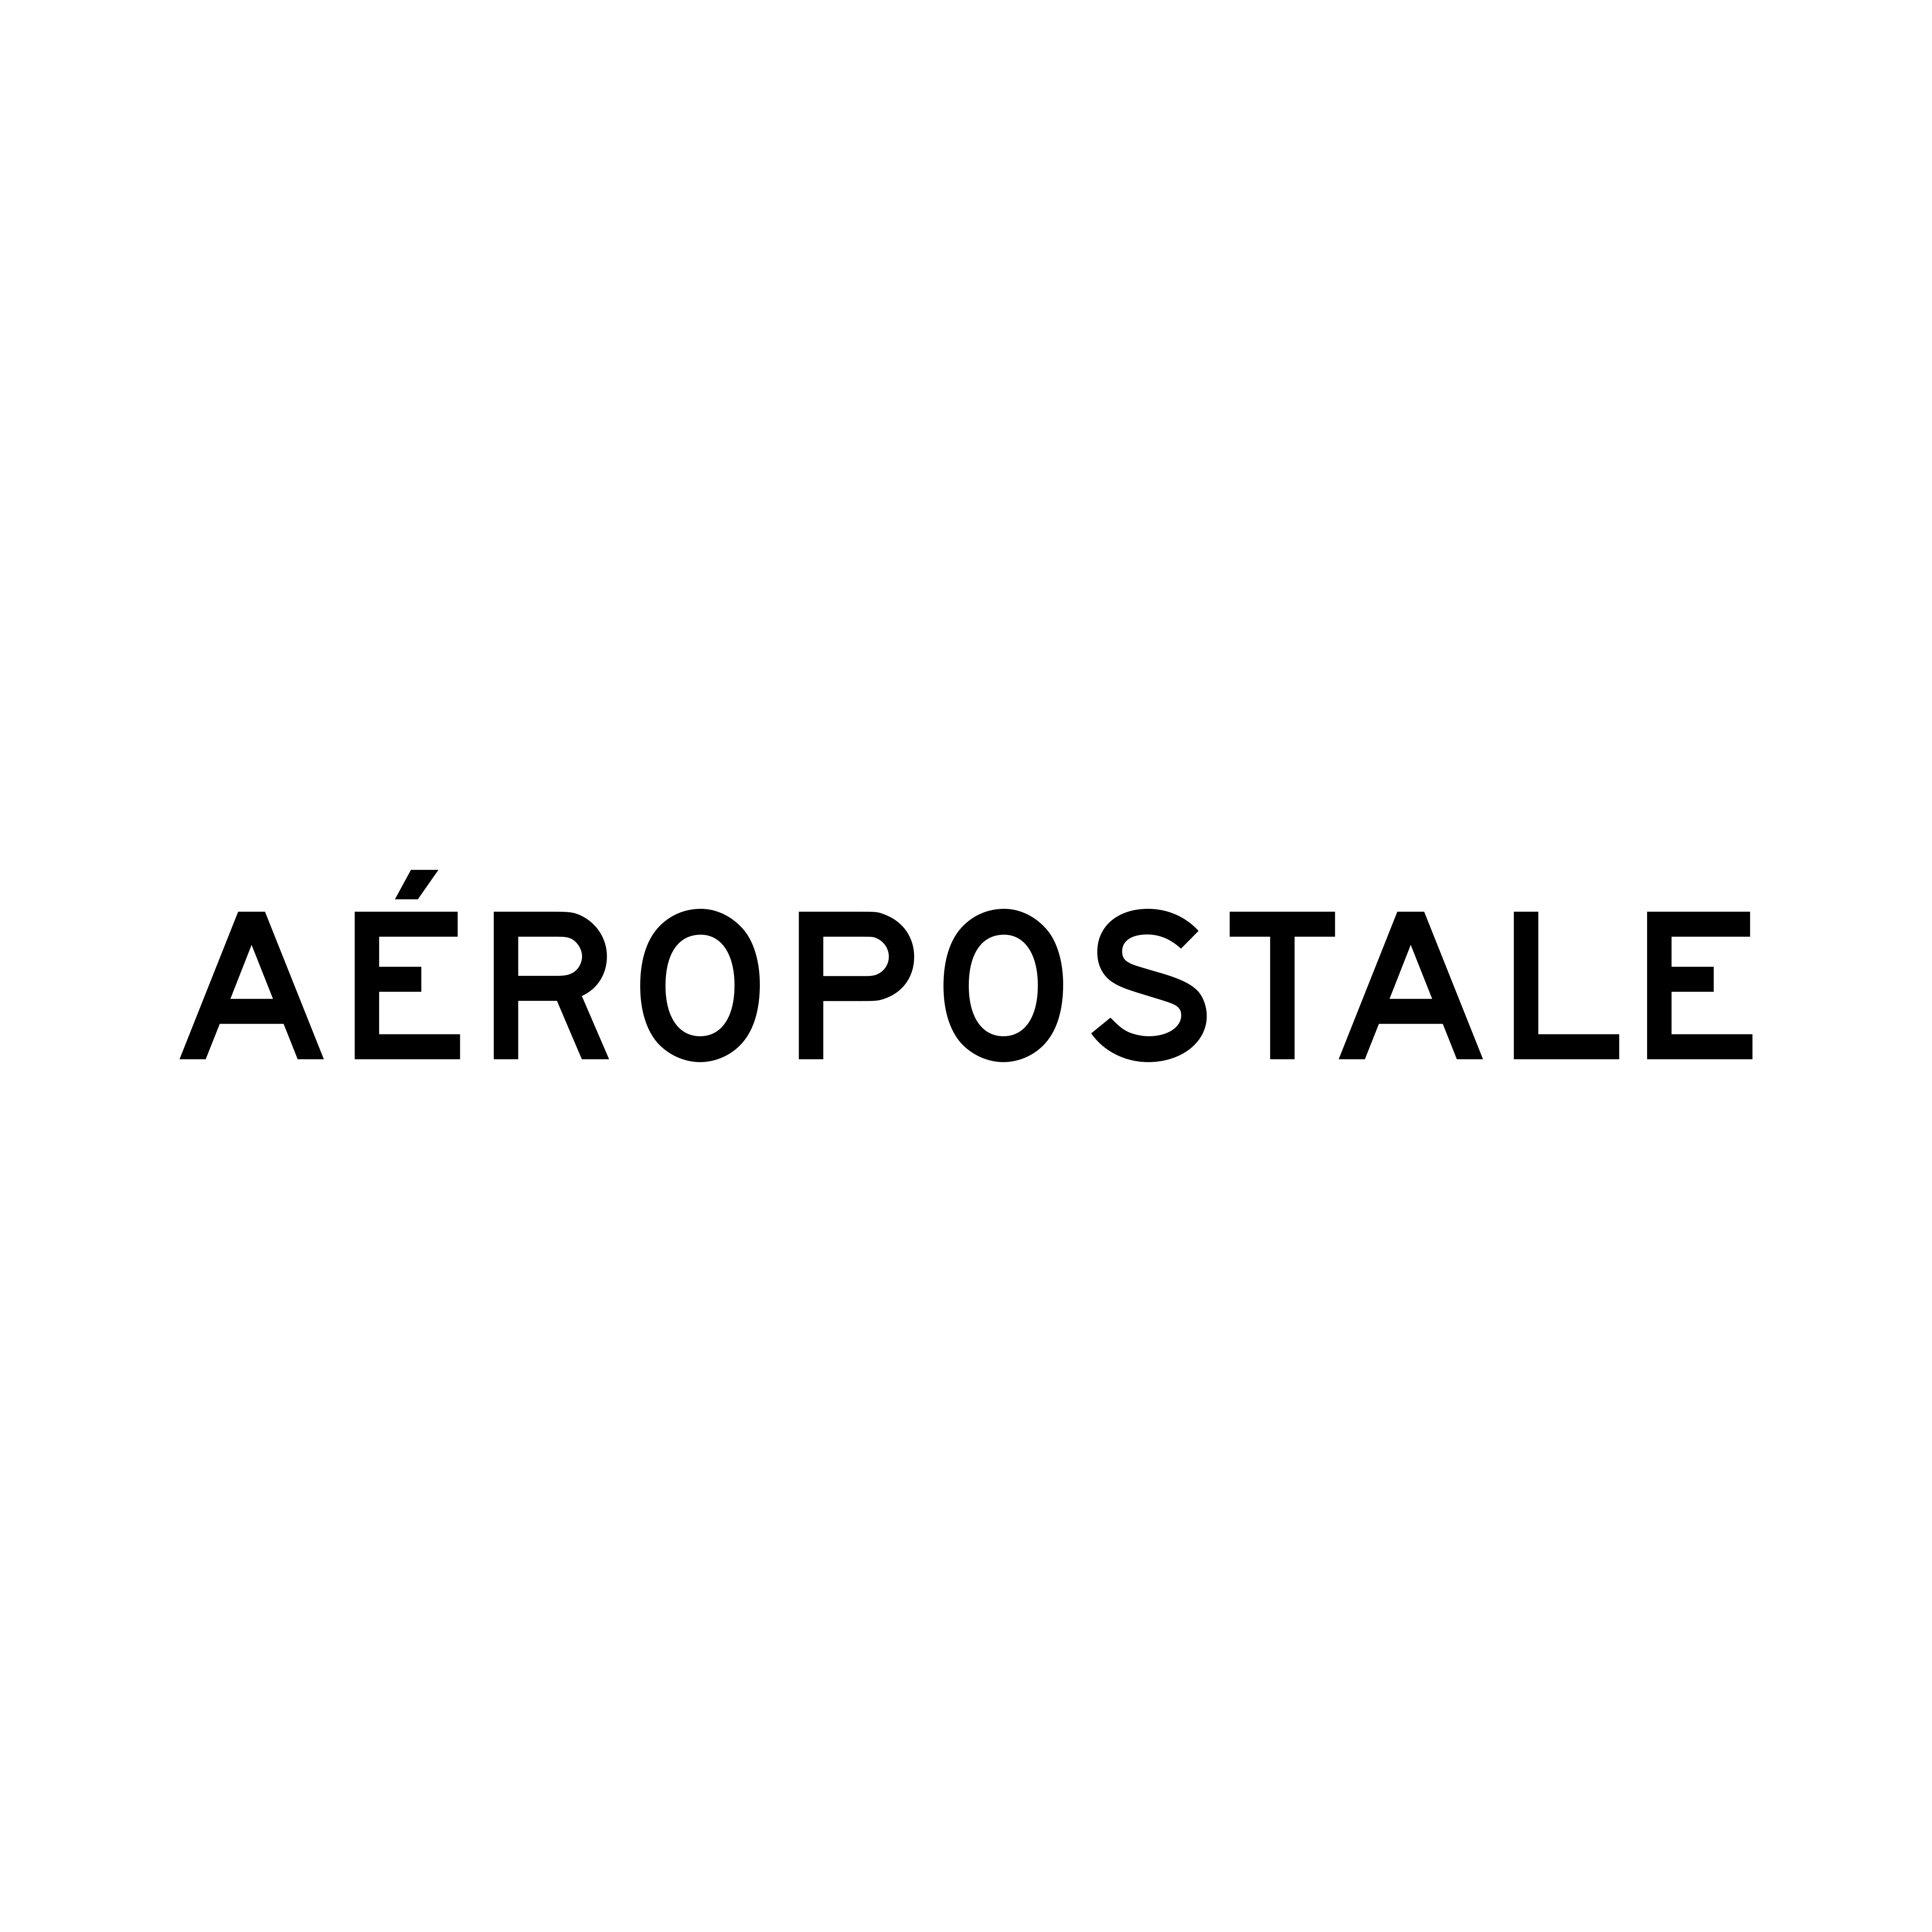 aeropostale logo 0 - Aeropostale Logo